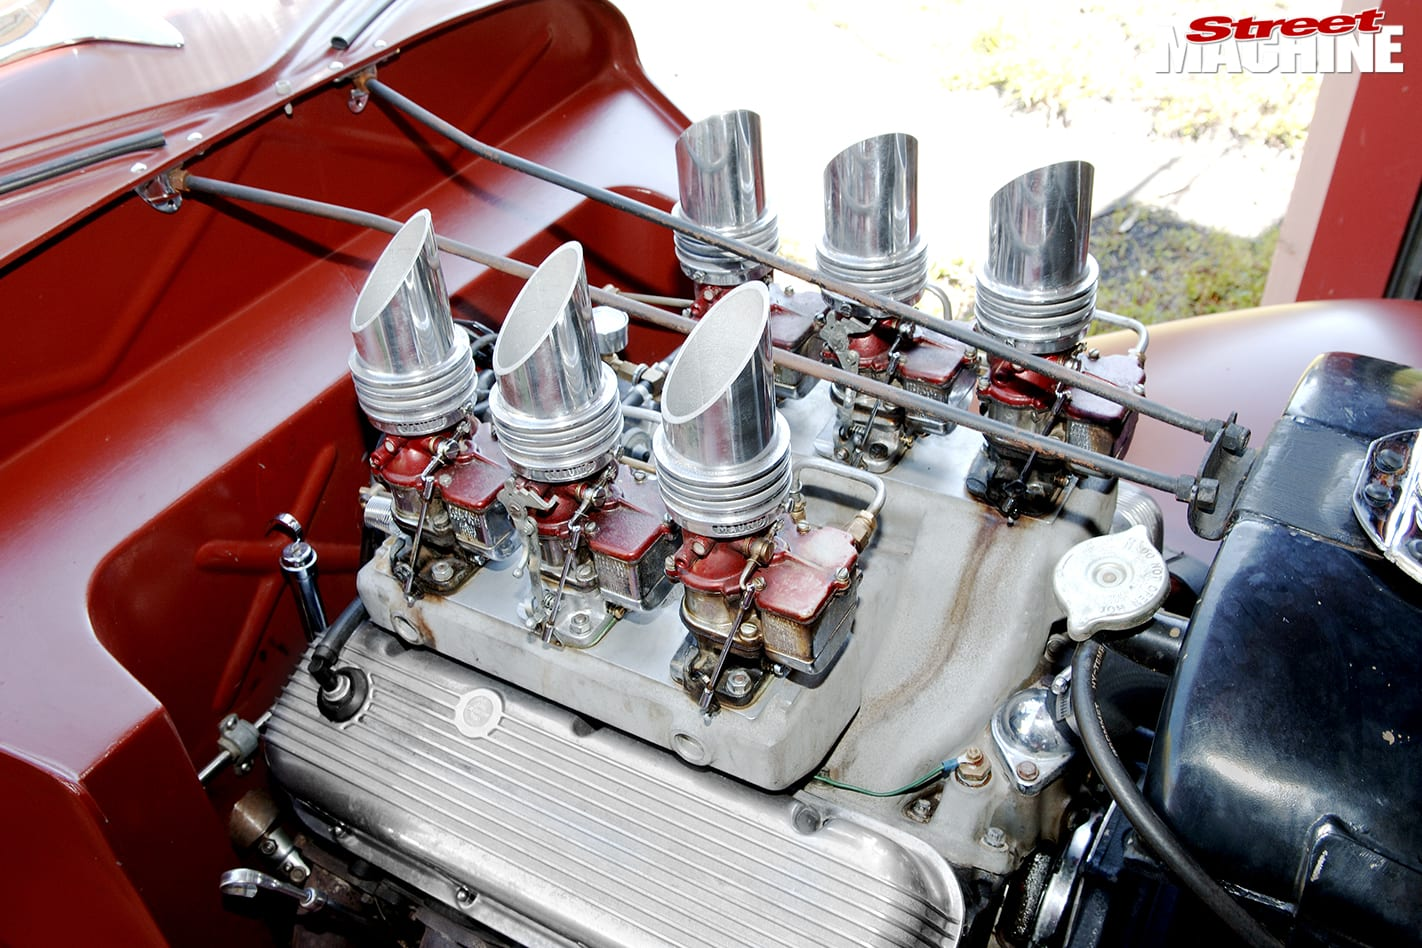 Hot Rod engine bay